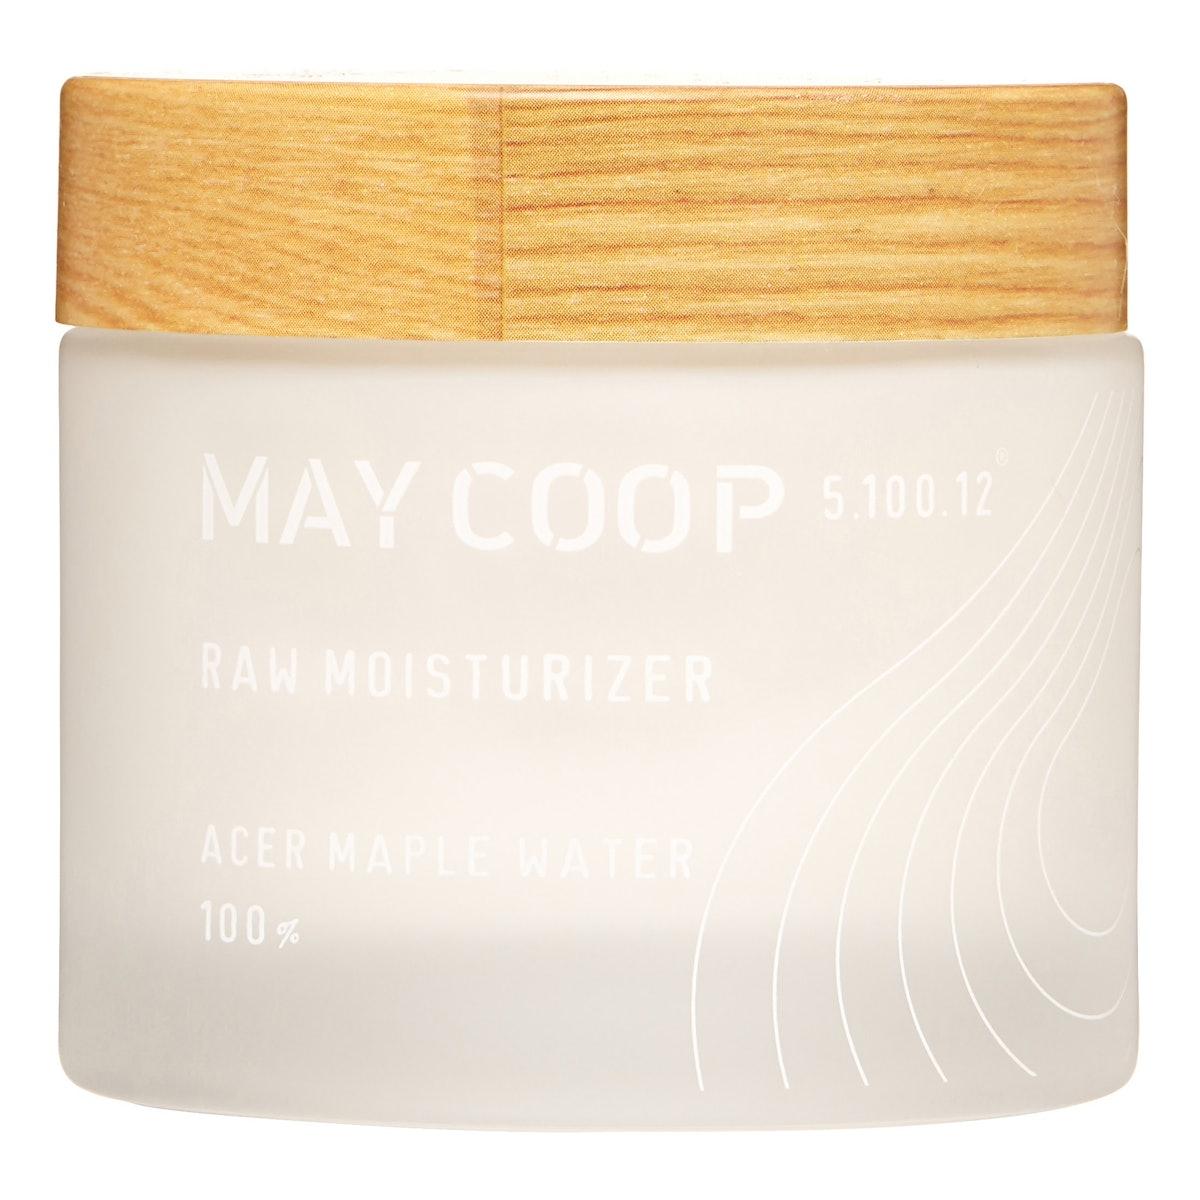 May Coop Raw Moisturizer 2.7 Oz